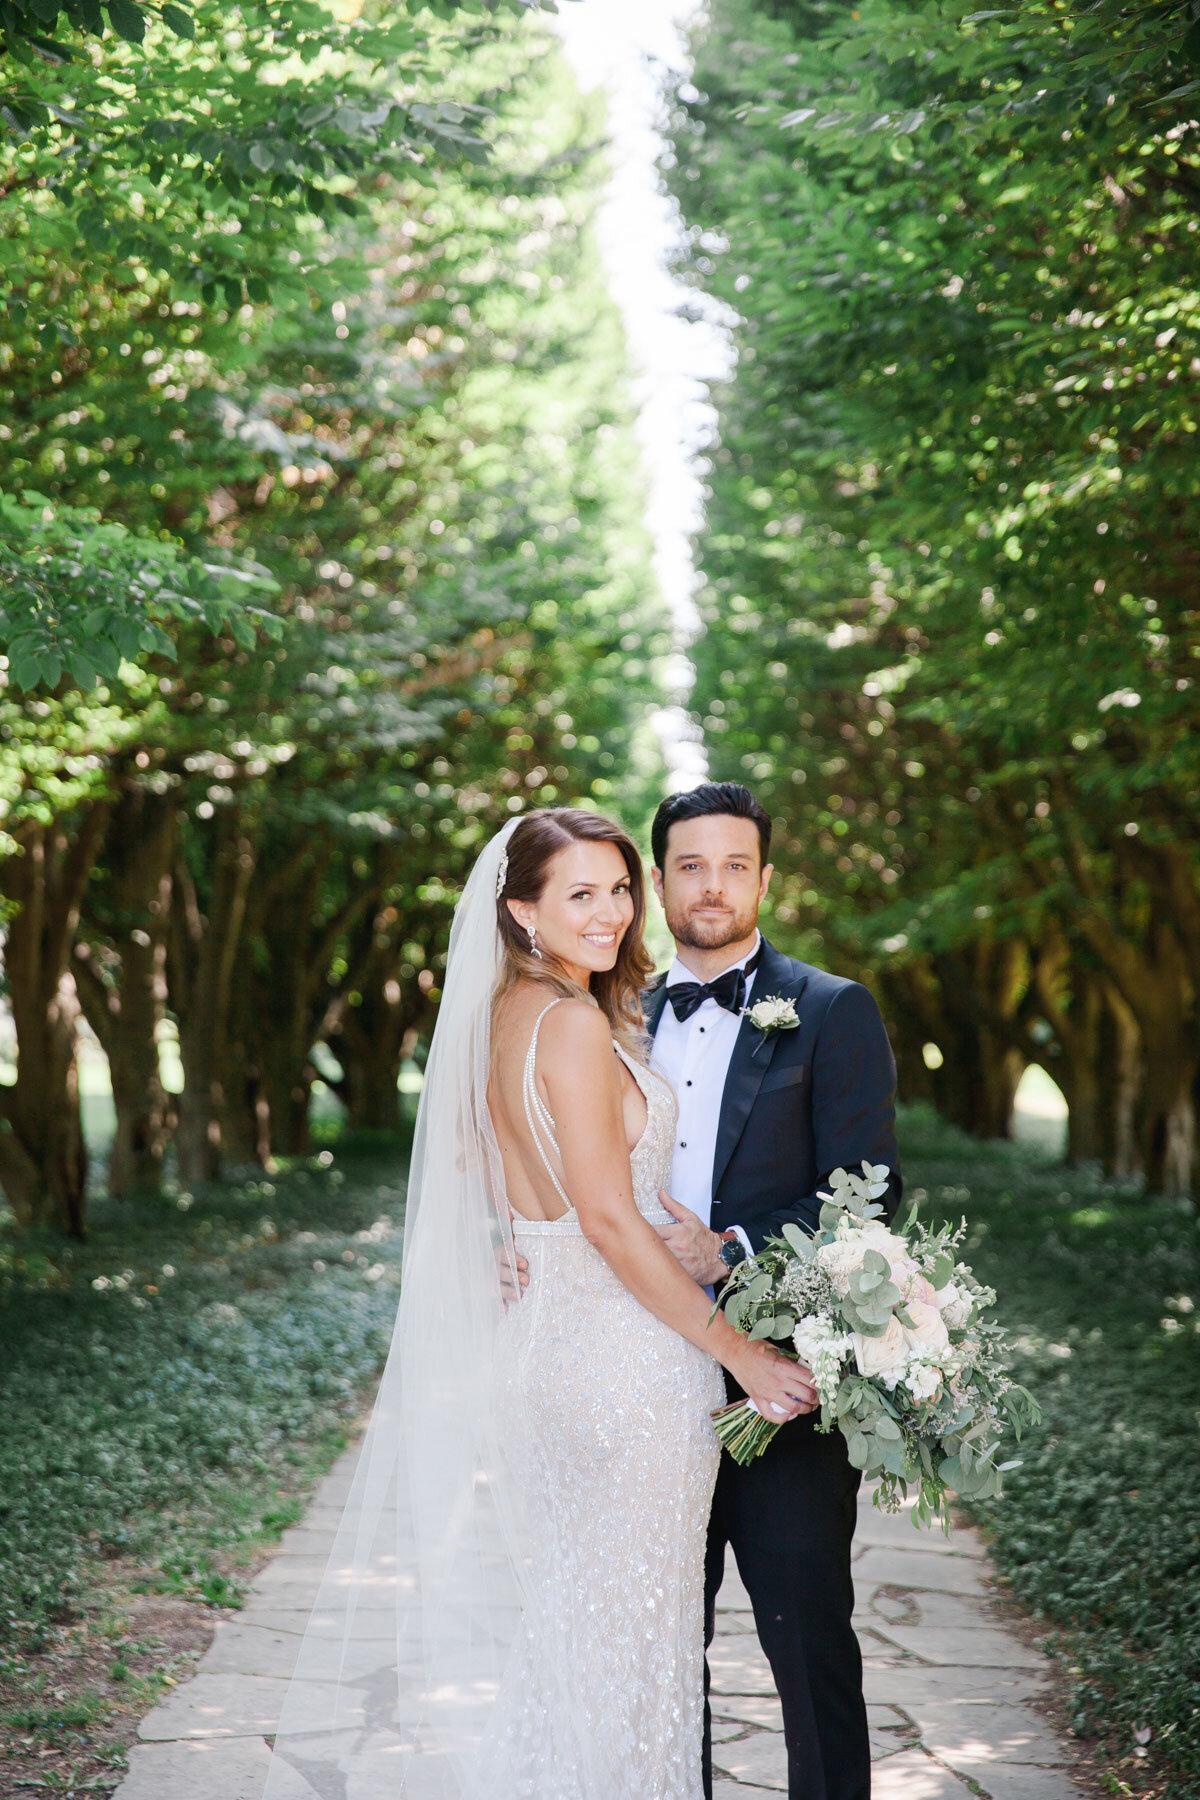 Chateau-des-Charmes-Wedding-Summer-Vineyard-Bride-Niagara-on-the-Lake-photos-by-Gemini-Photography-Ontario-0024.jpg